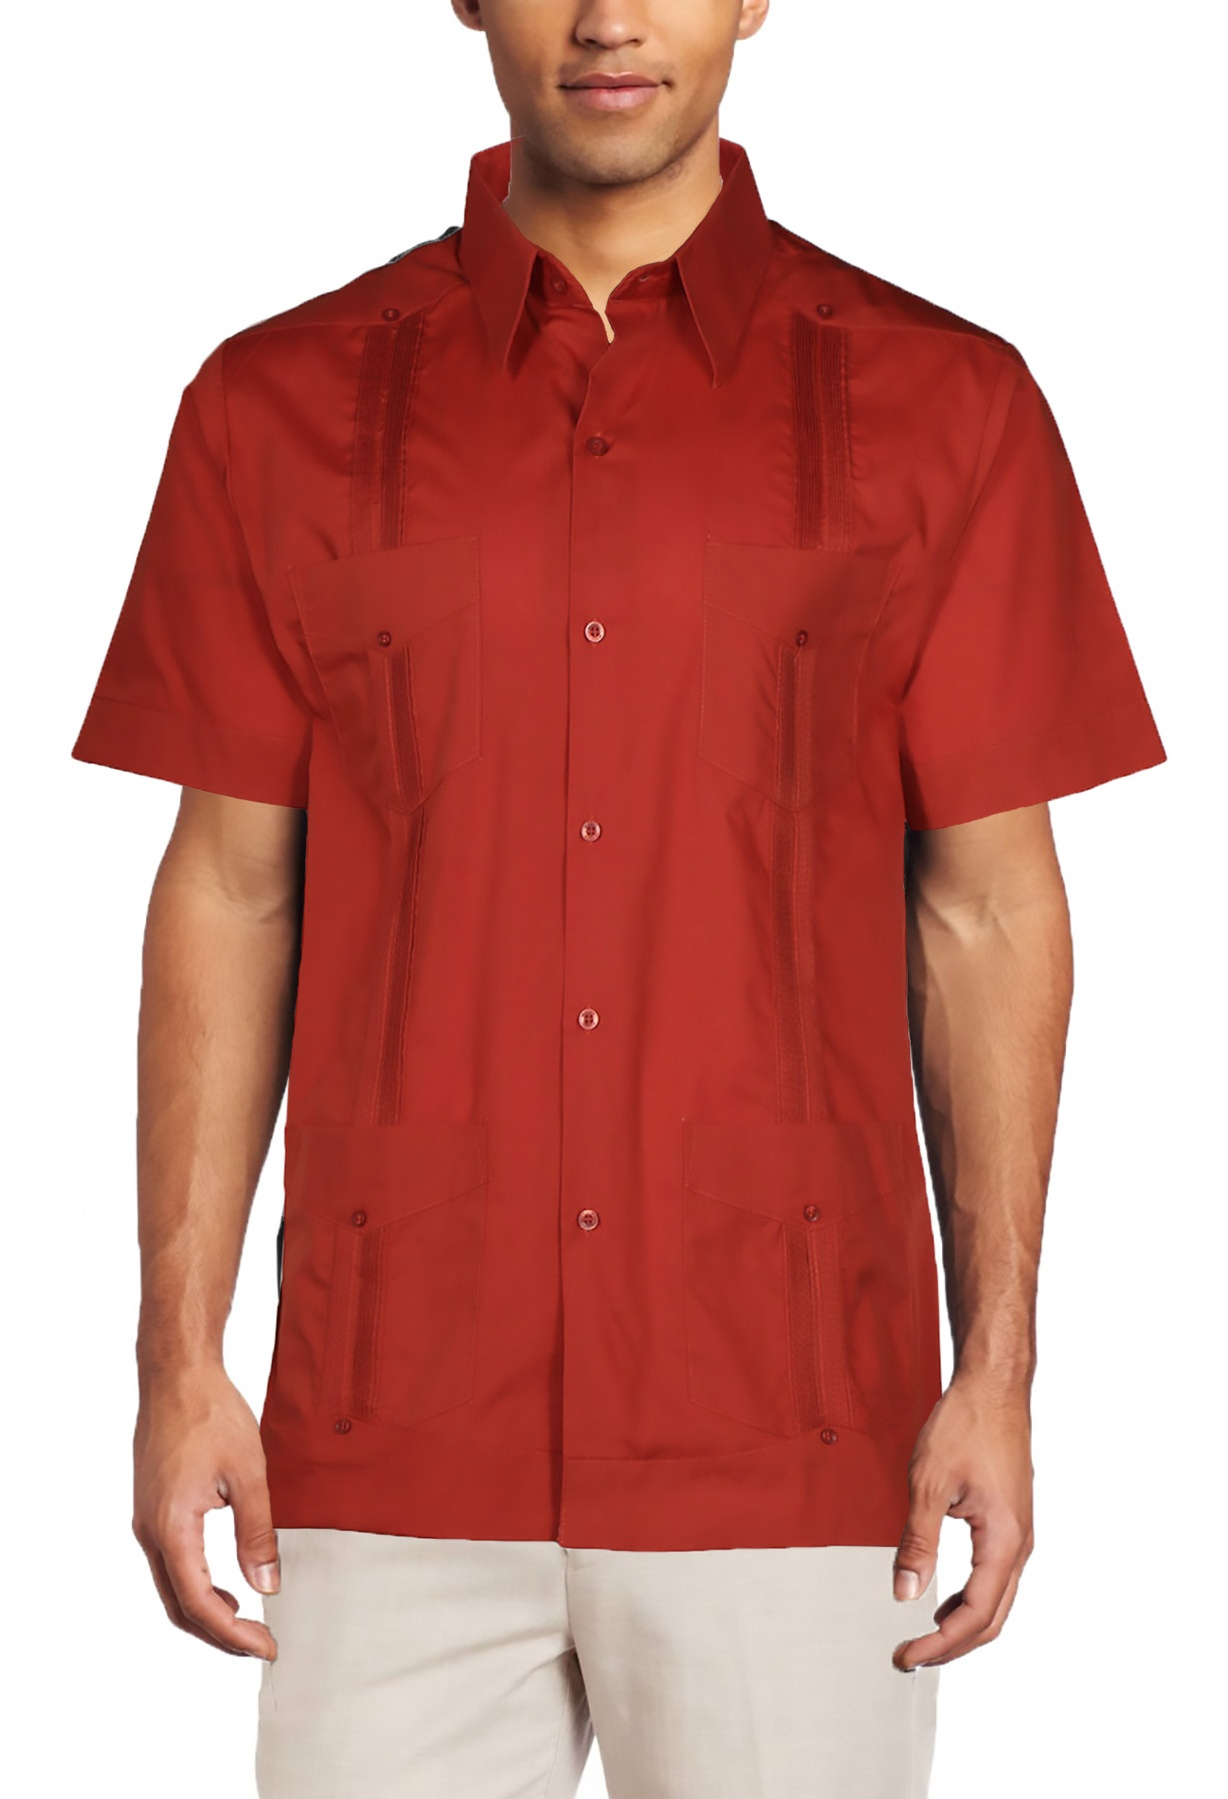 c86240ea5f2fa Mojito Collection - Mojito Collection Men s Short Sleeve Guayabera Shirt -  Walmart.com